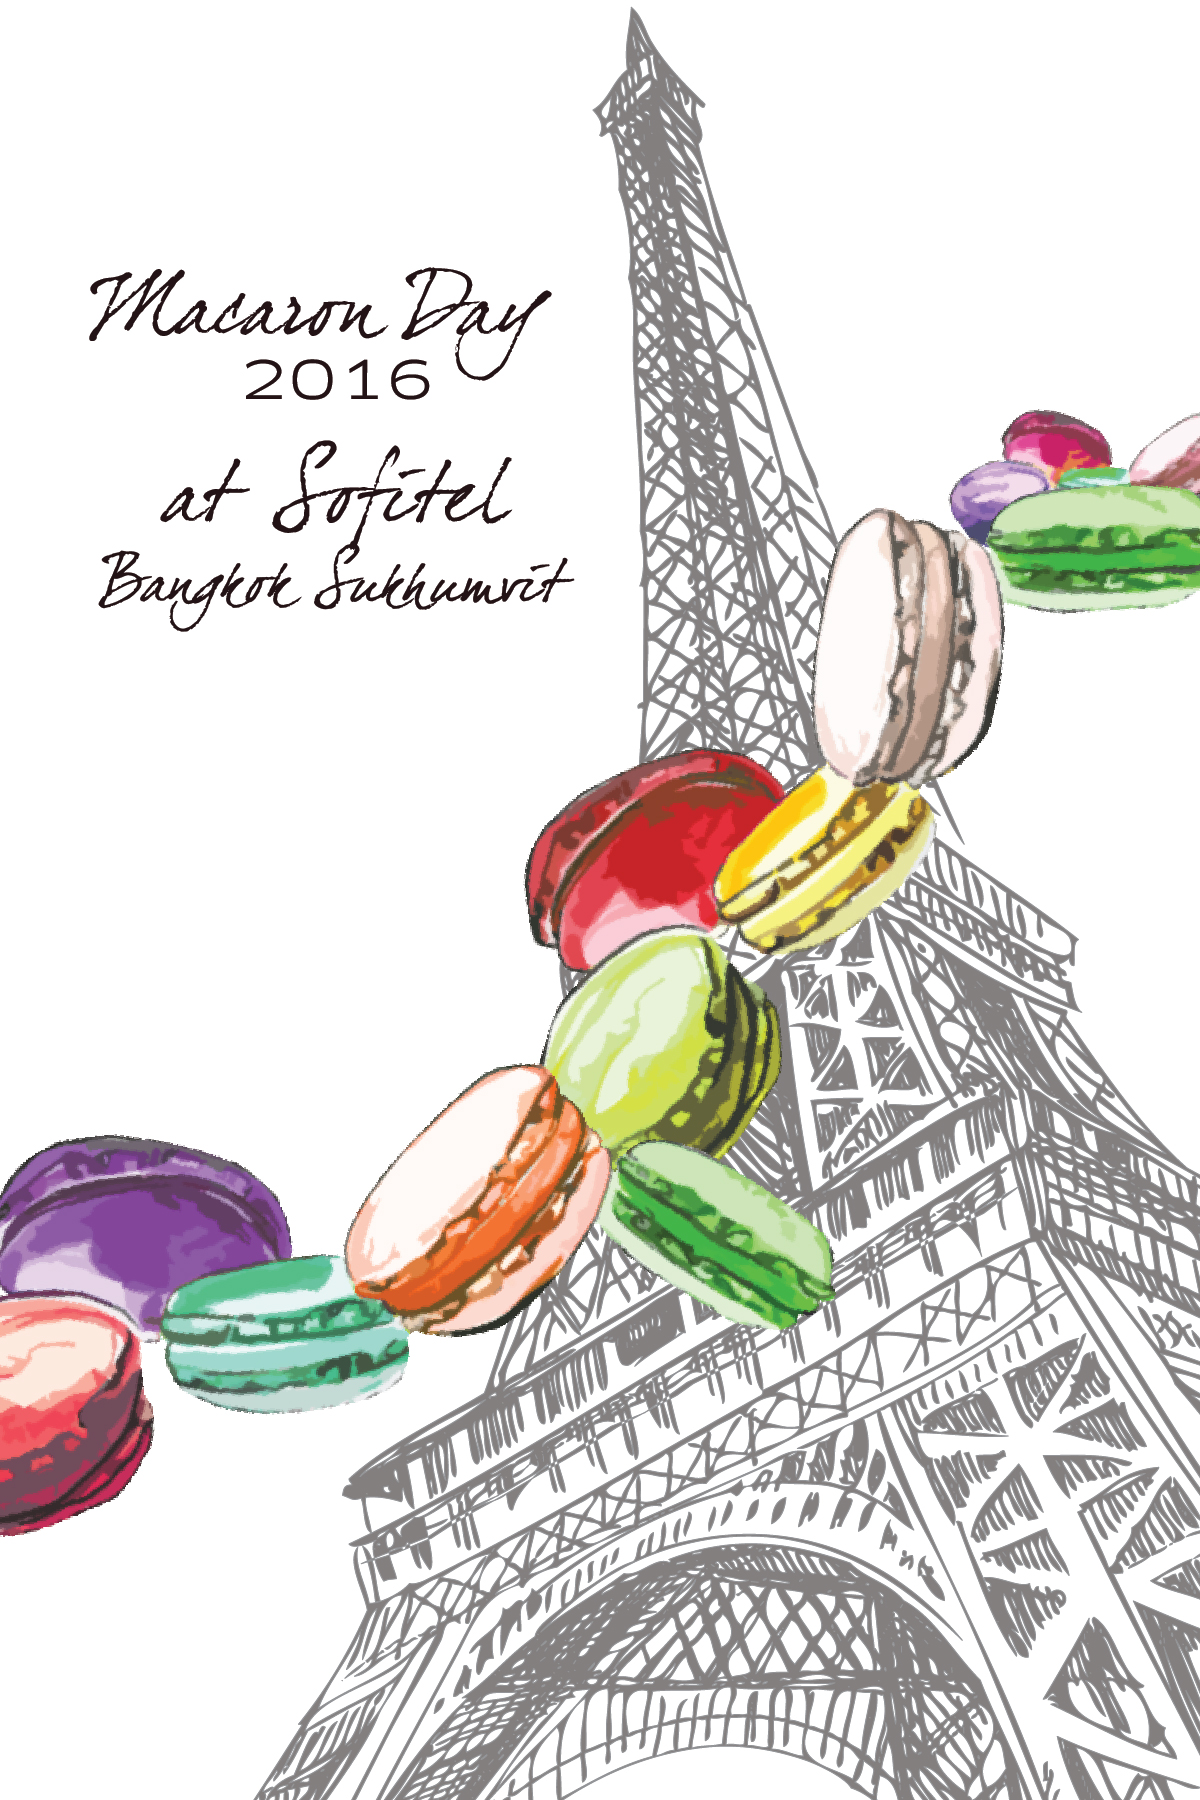 "For the Love of Sumptuous Macarons_Macaron Day 2016"" at Sofitel Bangkok Sukhumvit"